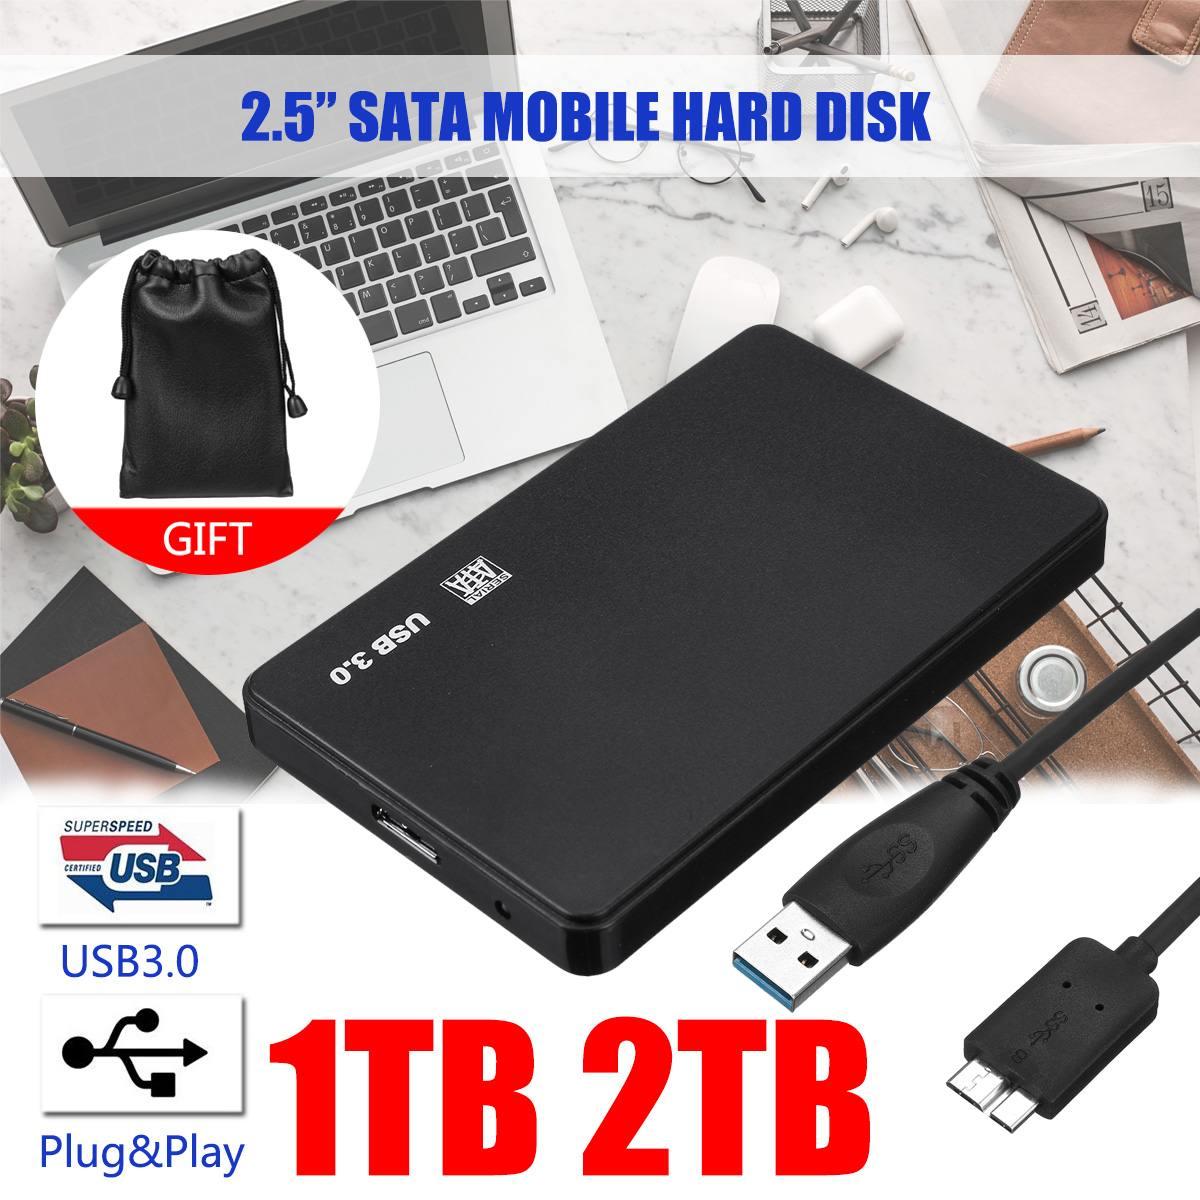 2.5 Mobile Hard Disk USB3.0 SATA3.0 1TB 2TB HDD Disco Duro Externo  External Hard Drives For Laptop/Mac/Xb